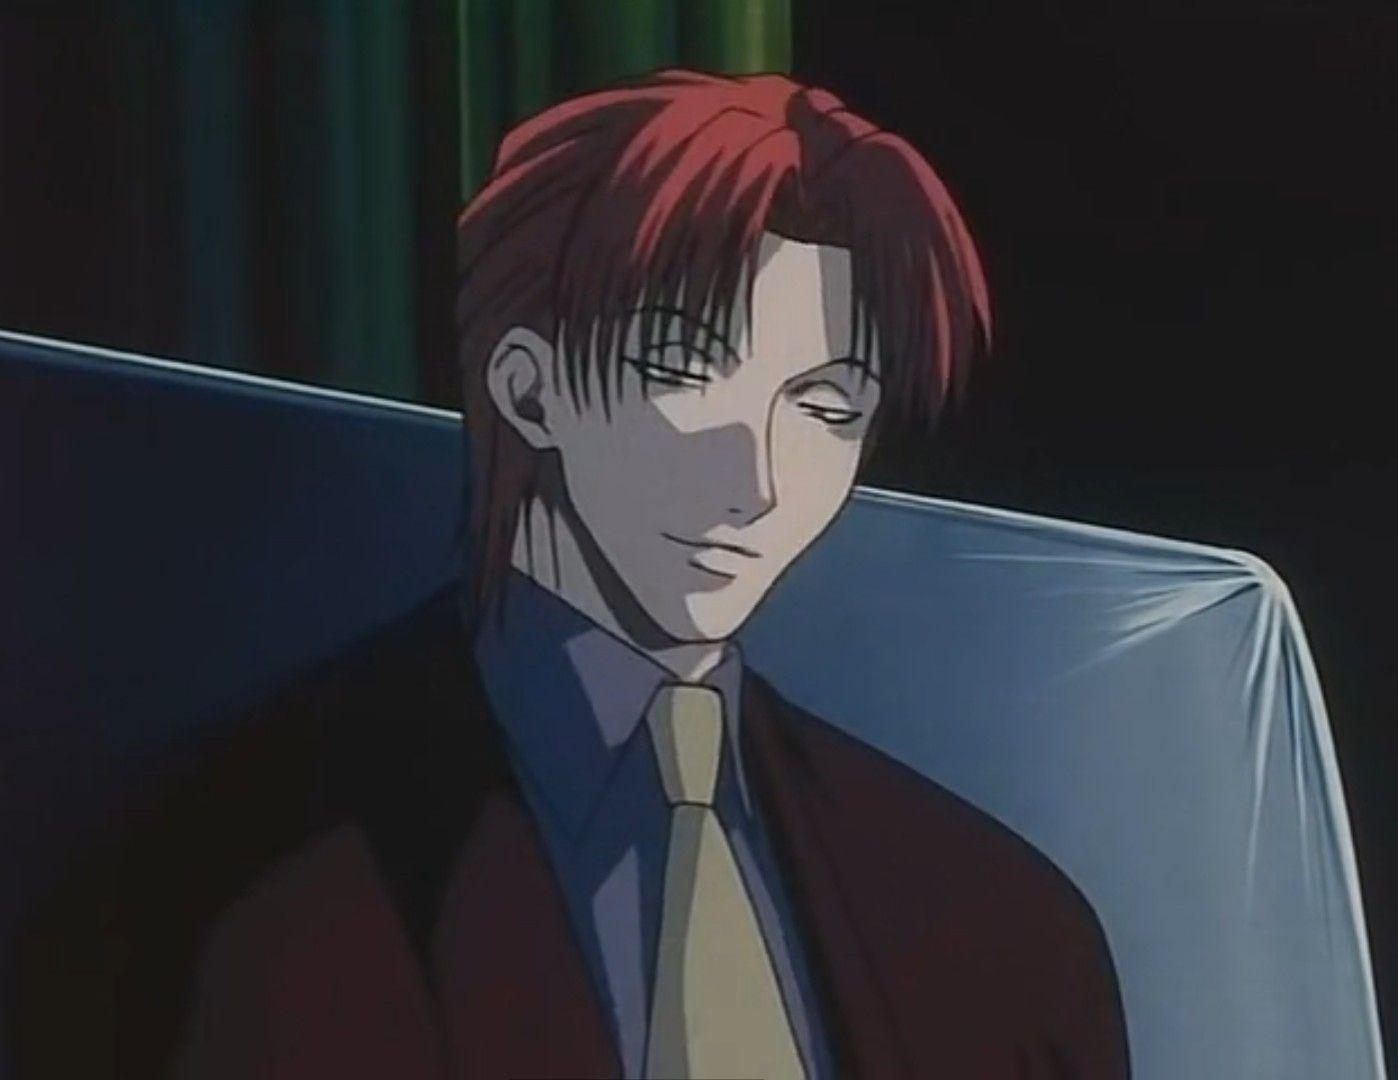 Hisoka Hunter X Hunter 1999 In 2020 Hisoka Aesthetic Anime Hunter X Hunter